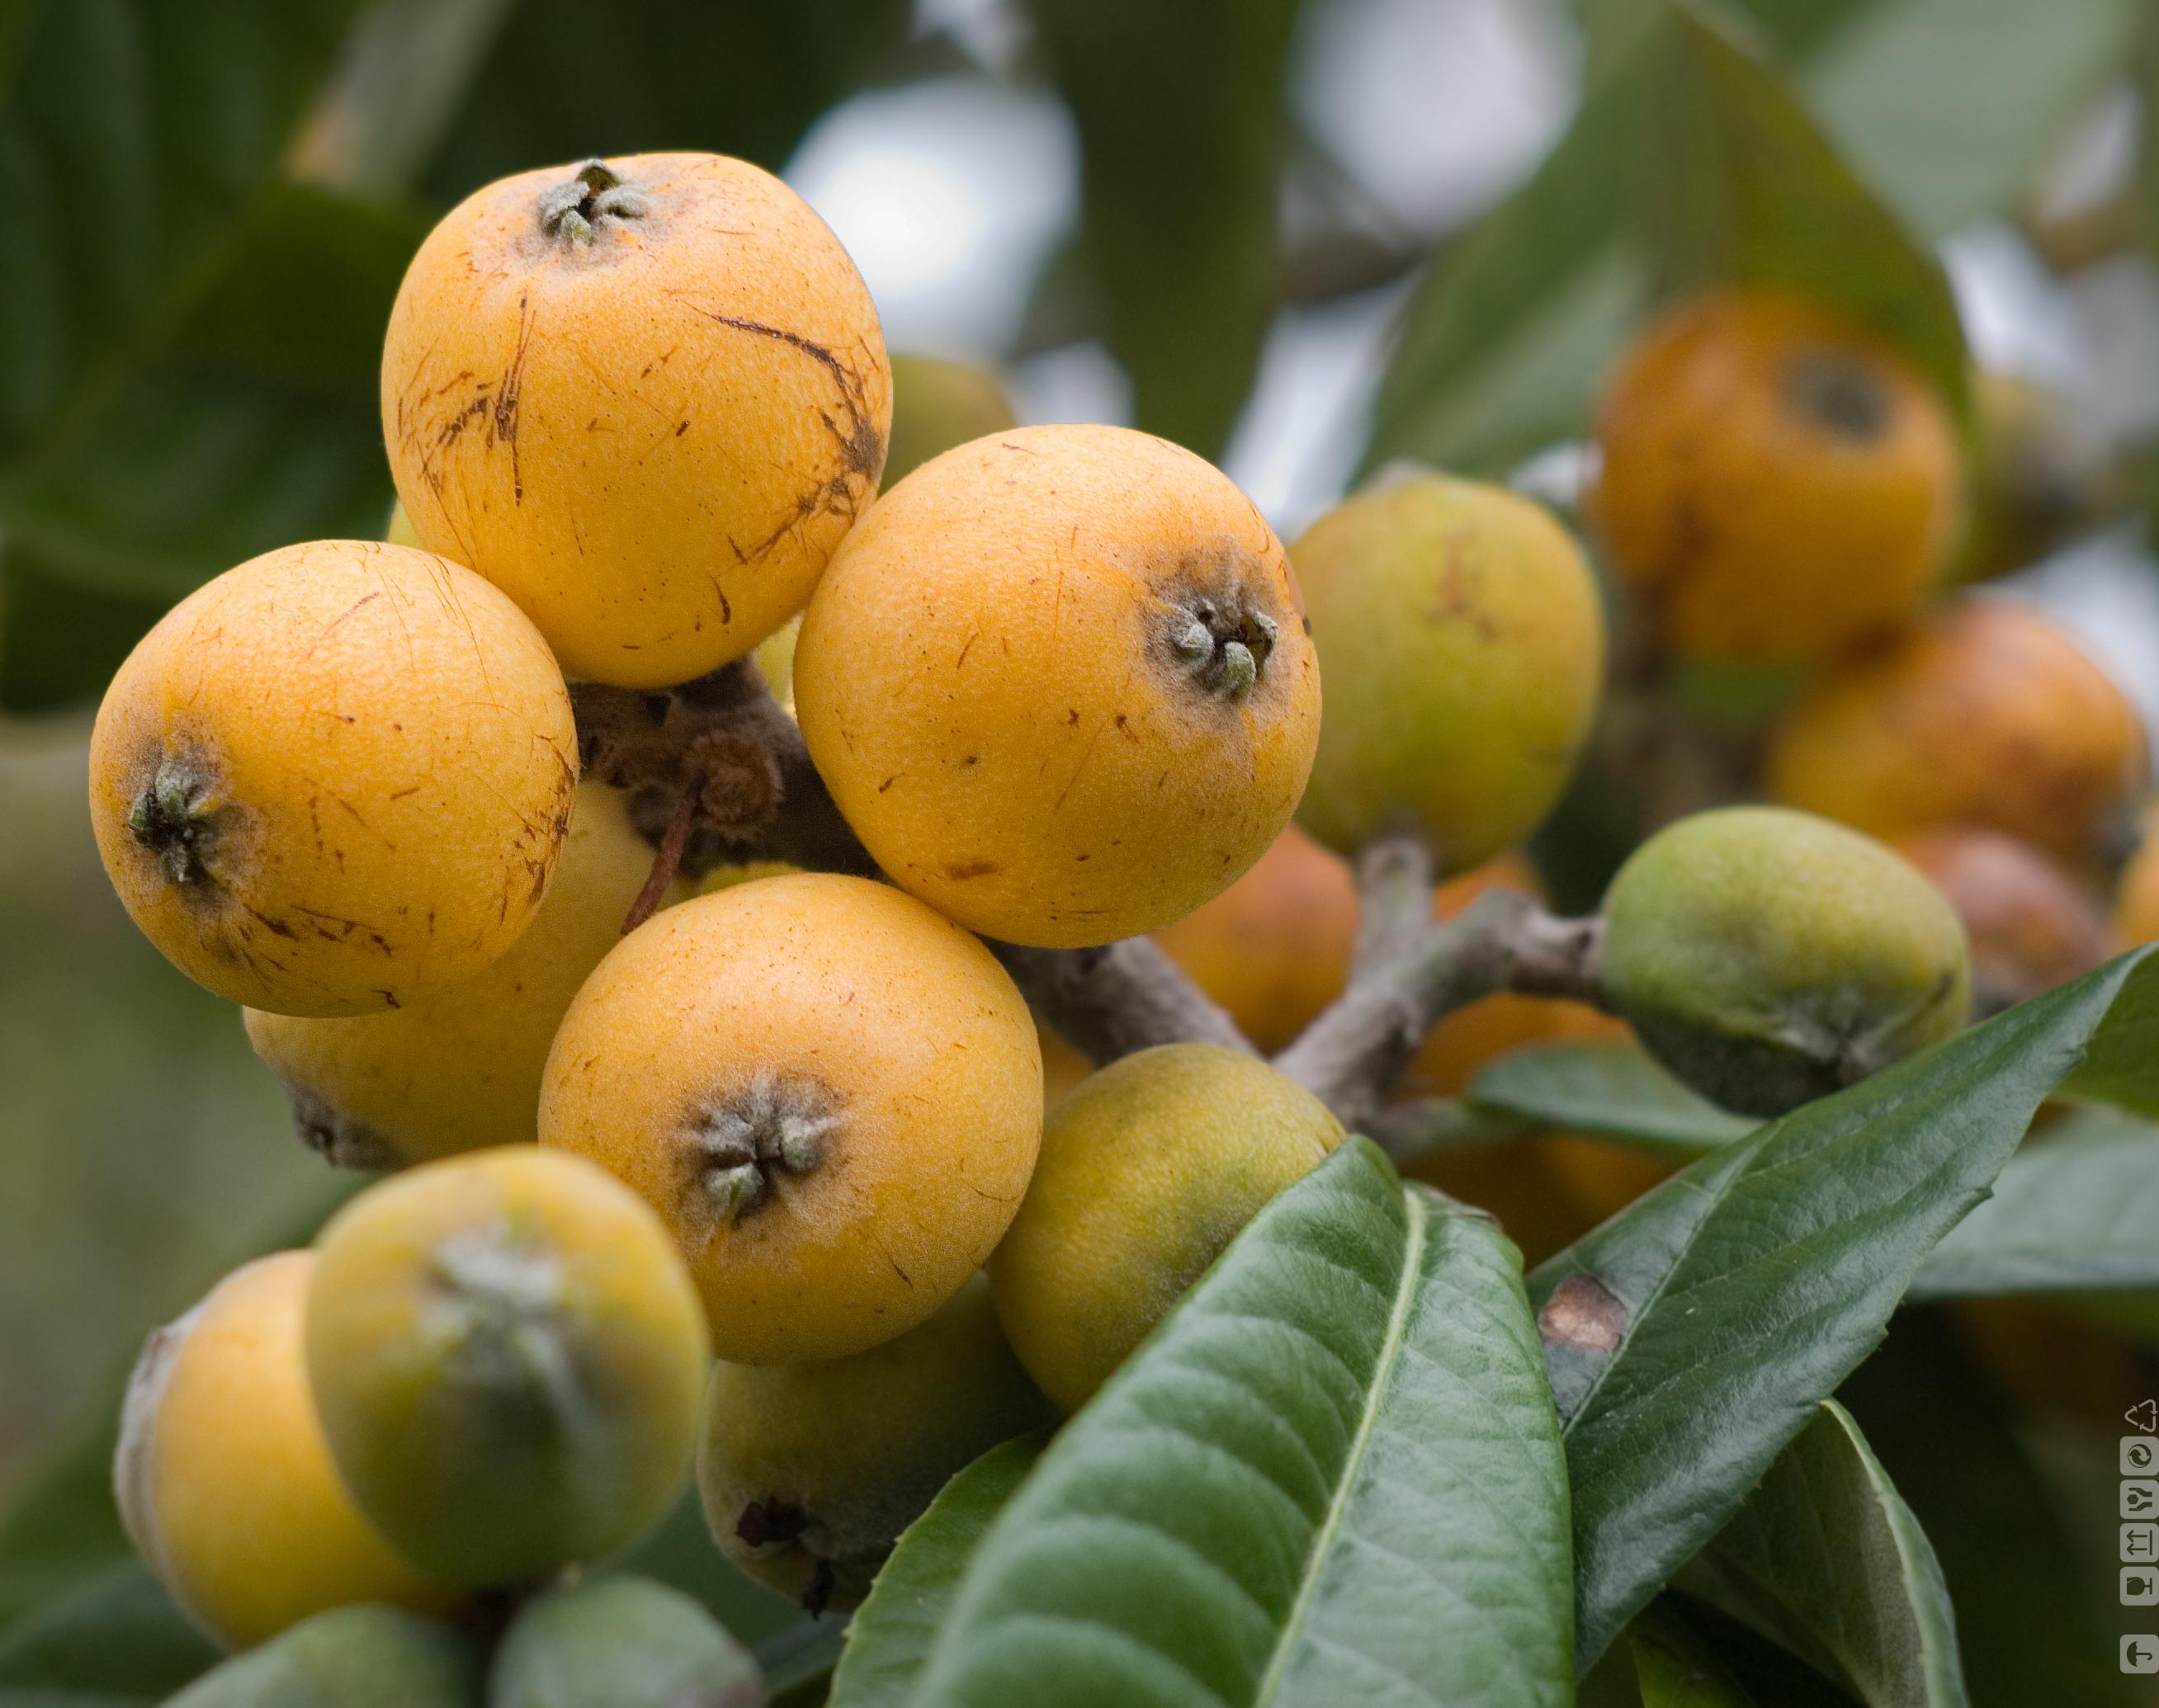 Maltese plum - Japanese medlar- Loquat - 枇杷 - níspero